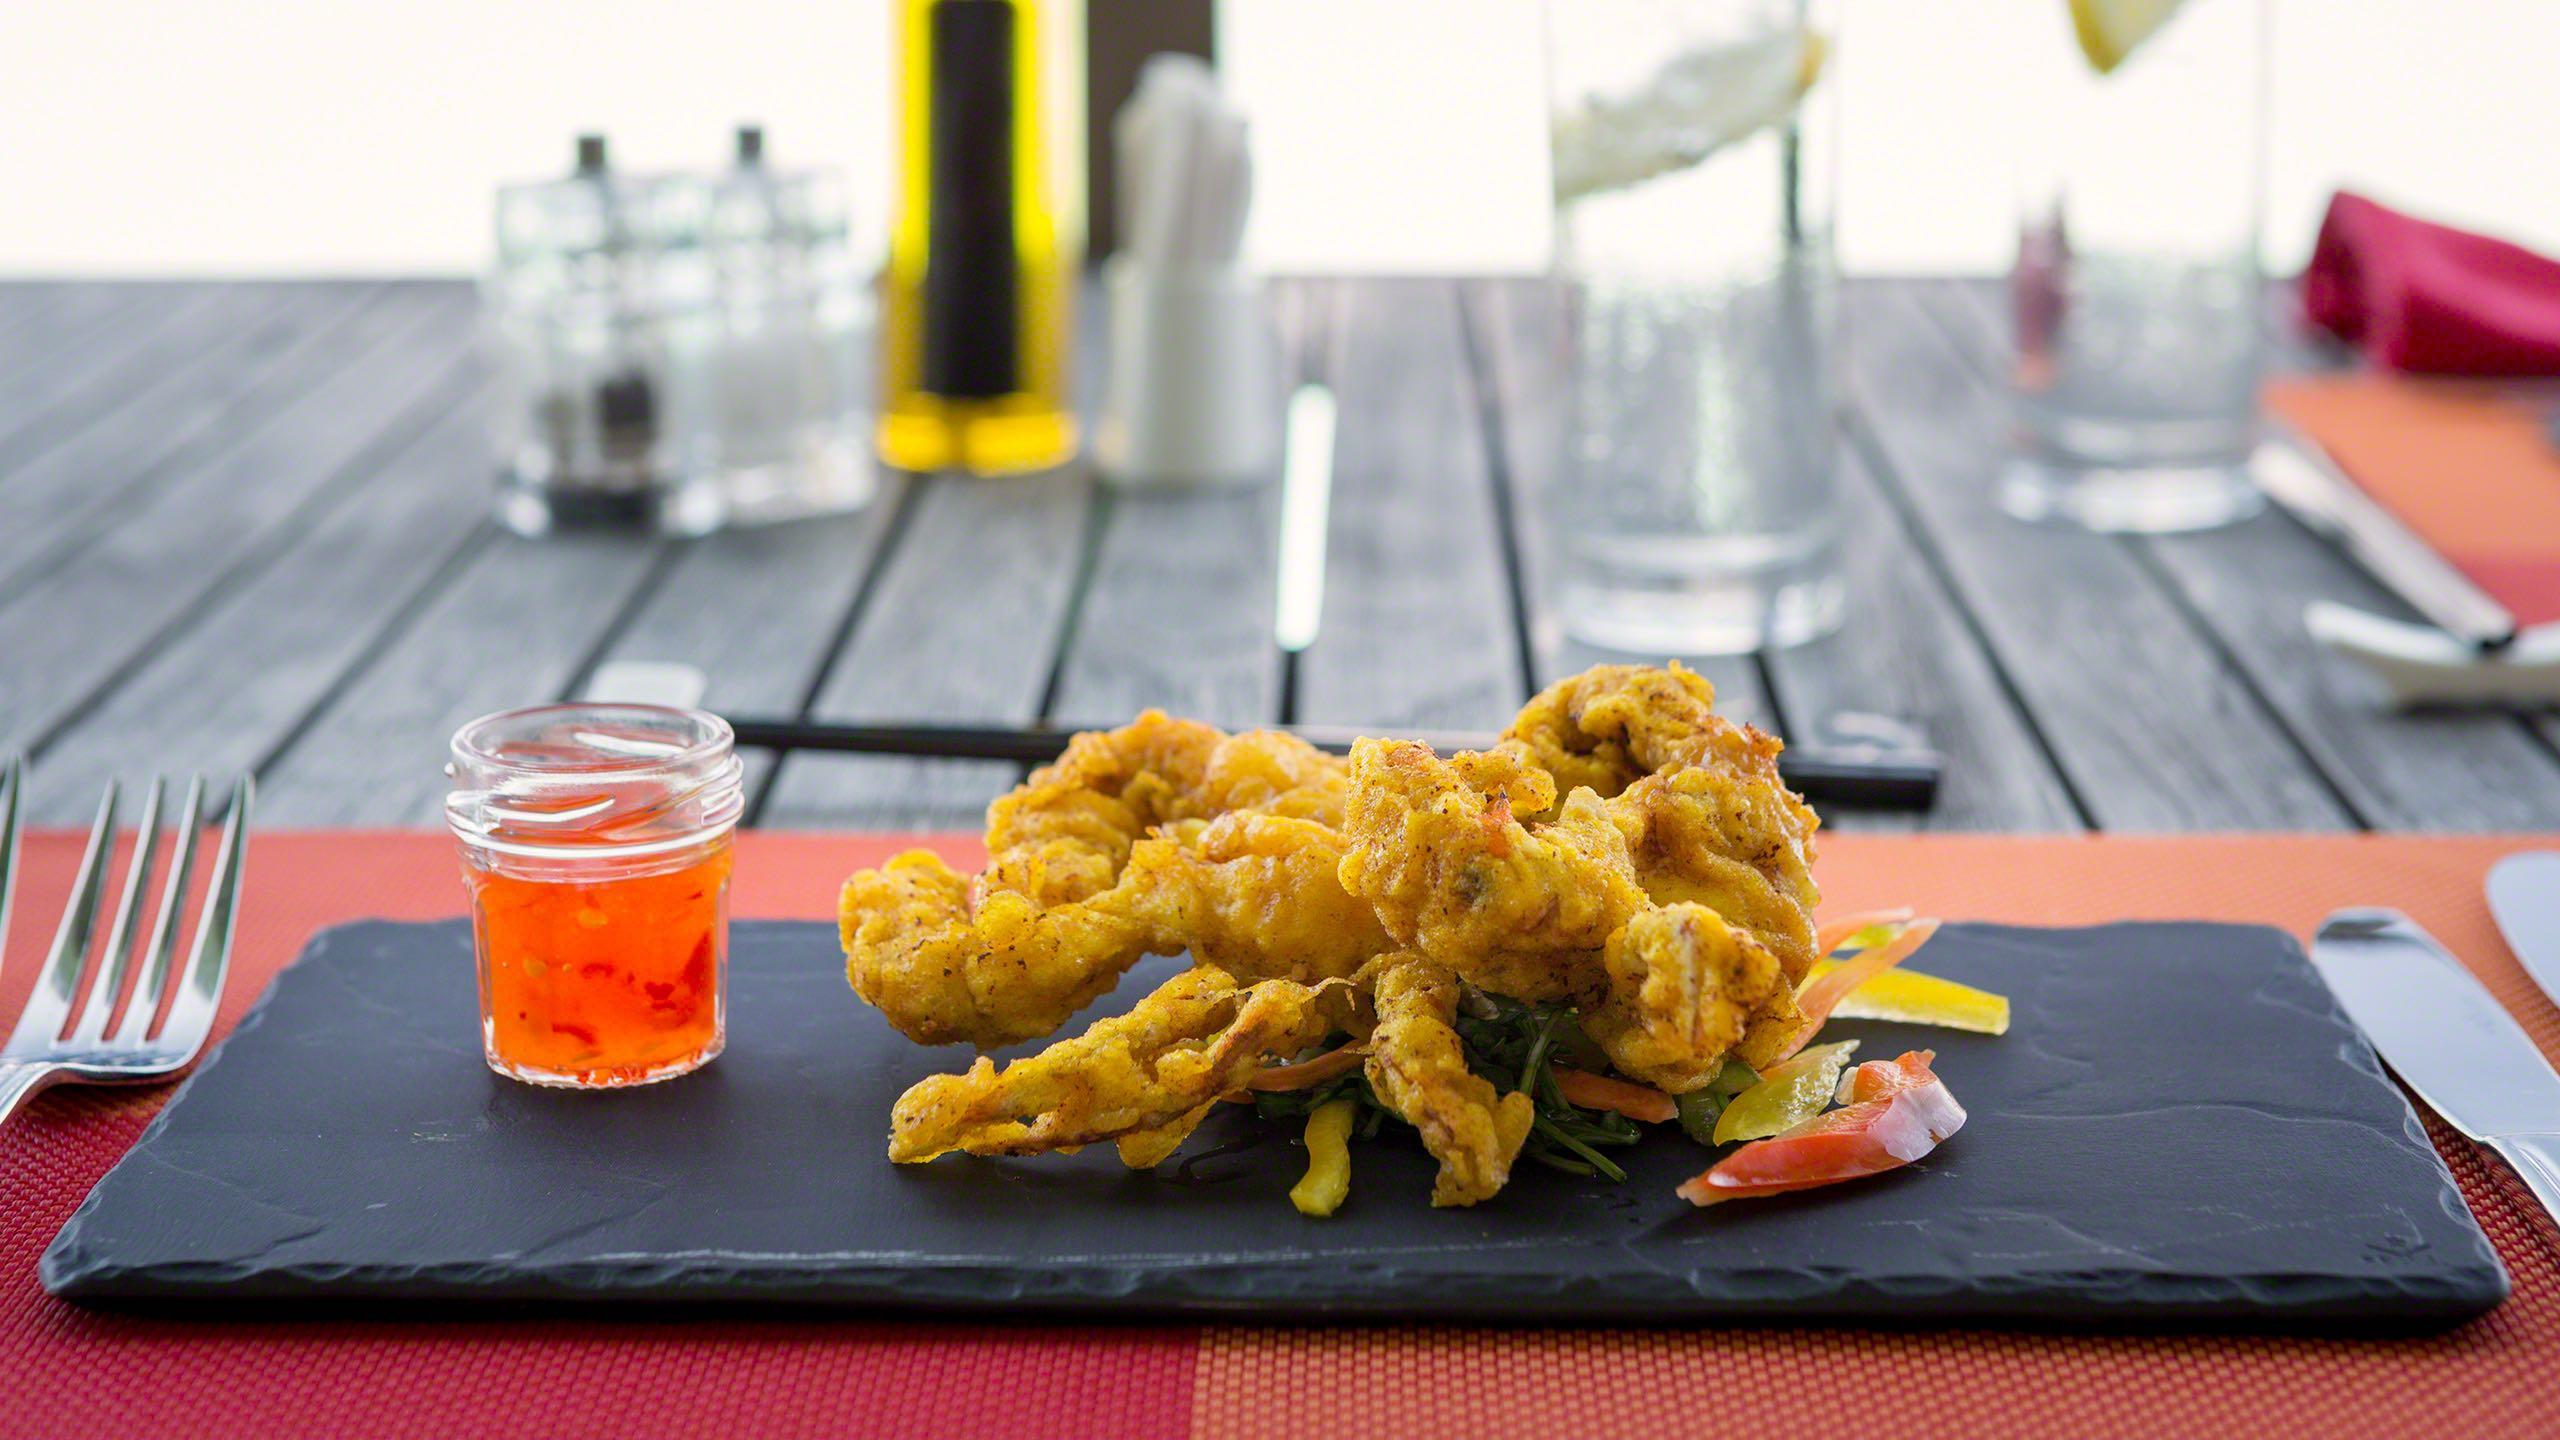 Etwas für Feinschmecker: Crispy soft shell crab ©Mirco Seyfert